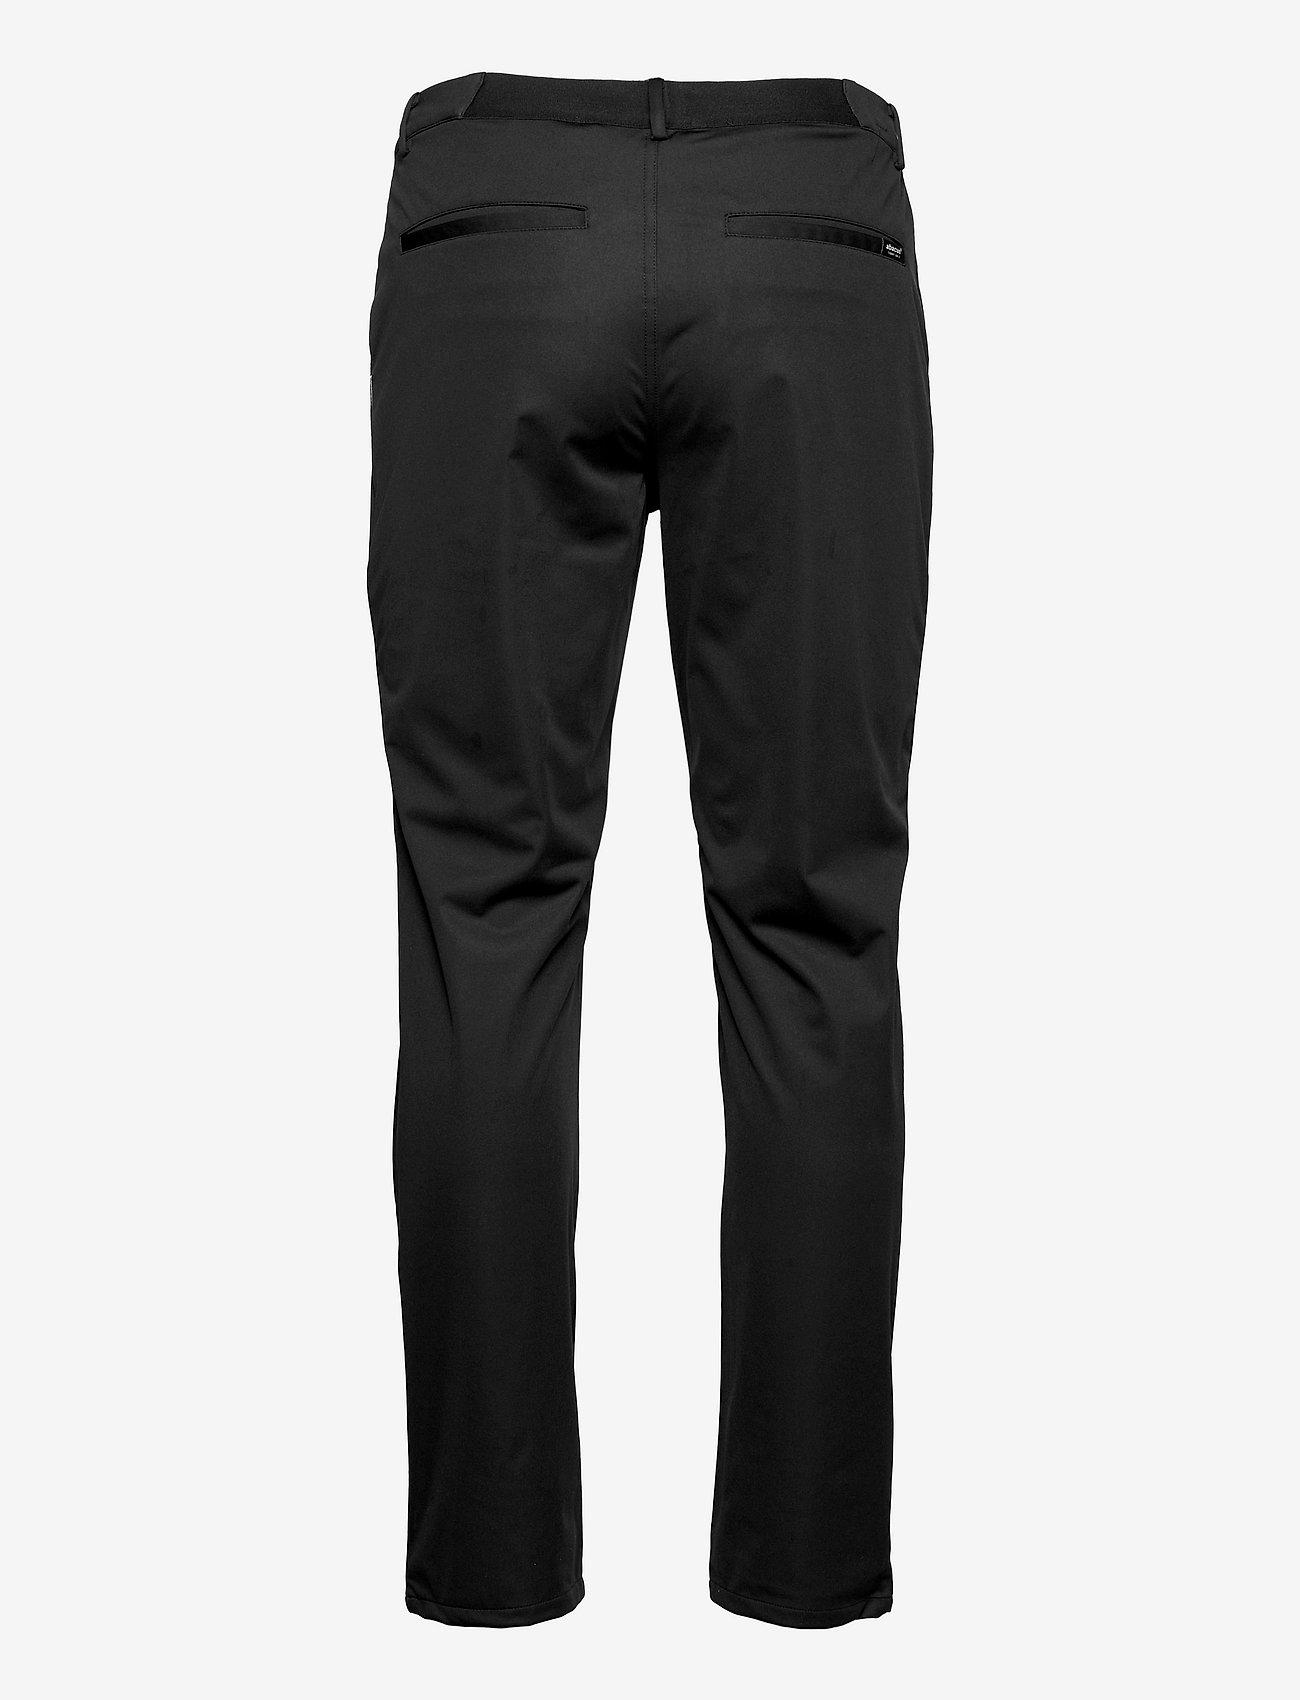 Abacus - Mens Tralee trousers - pantalon de golf - black - 1